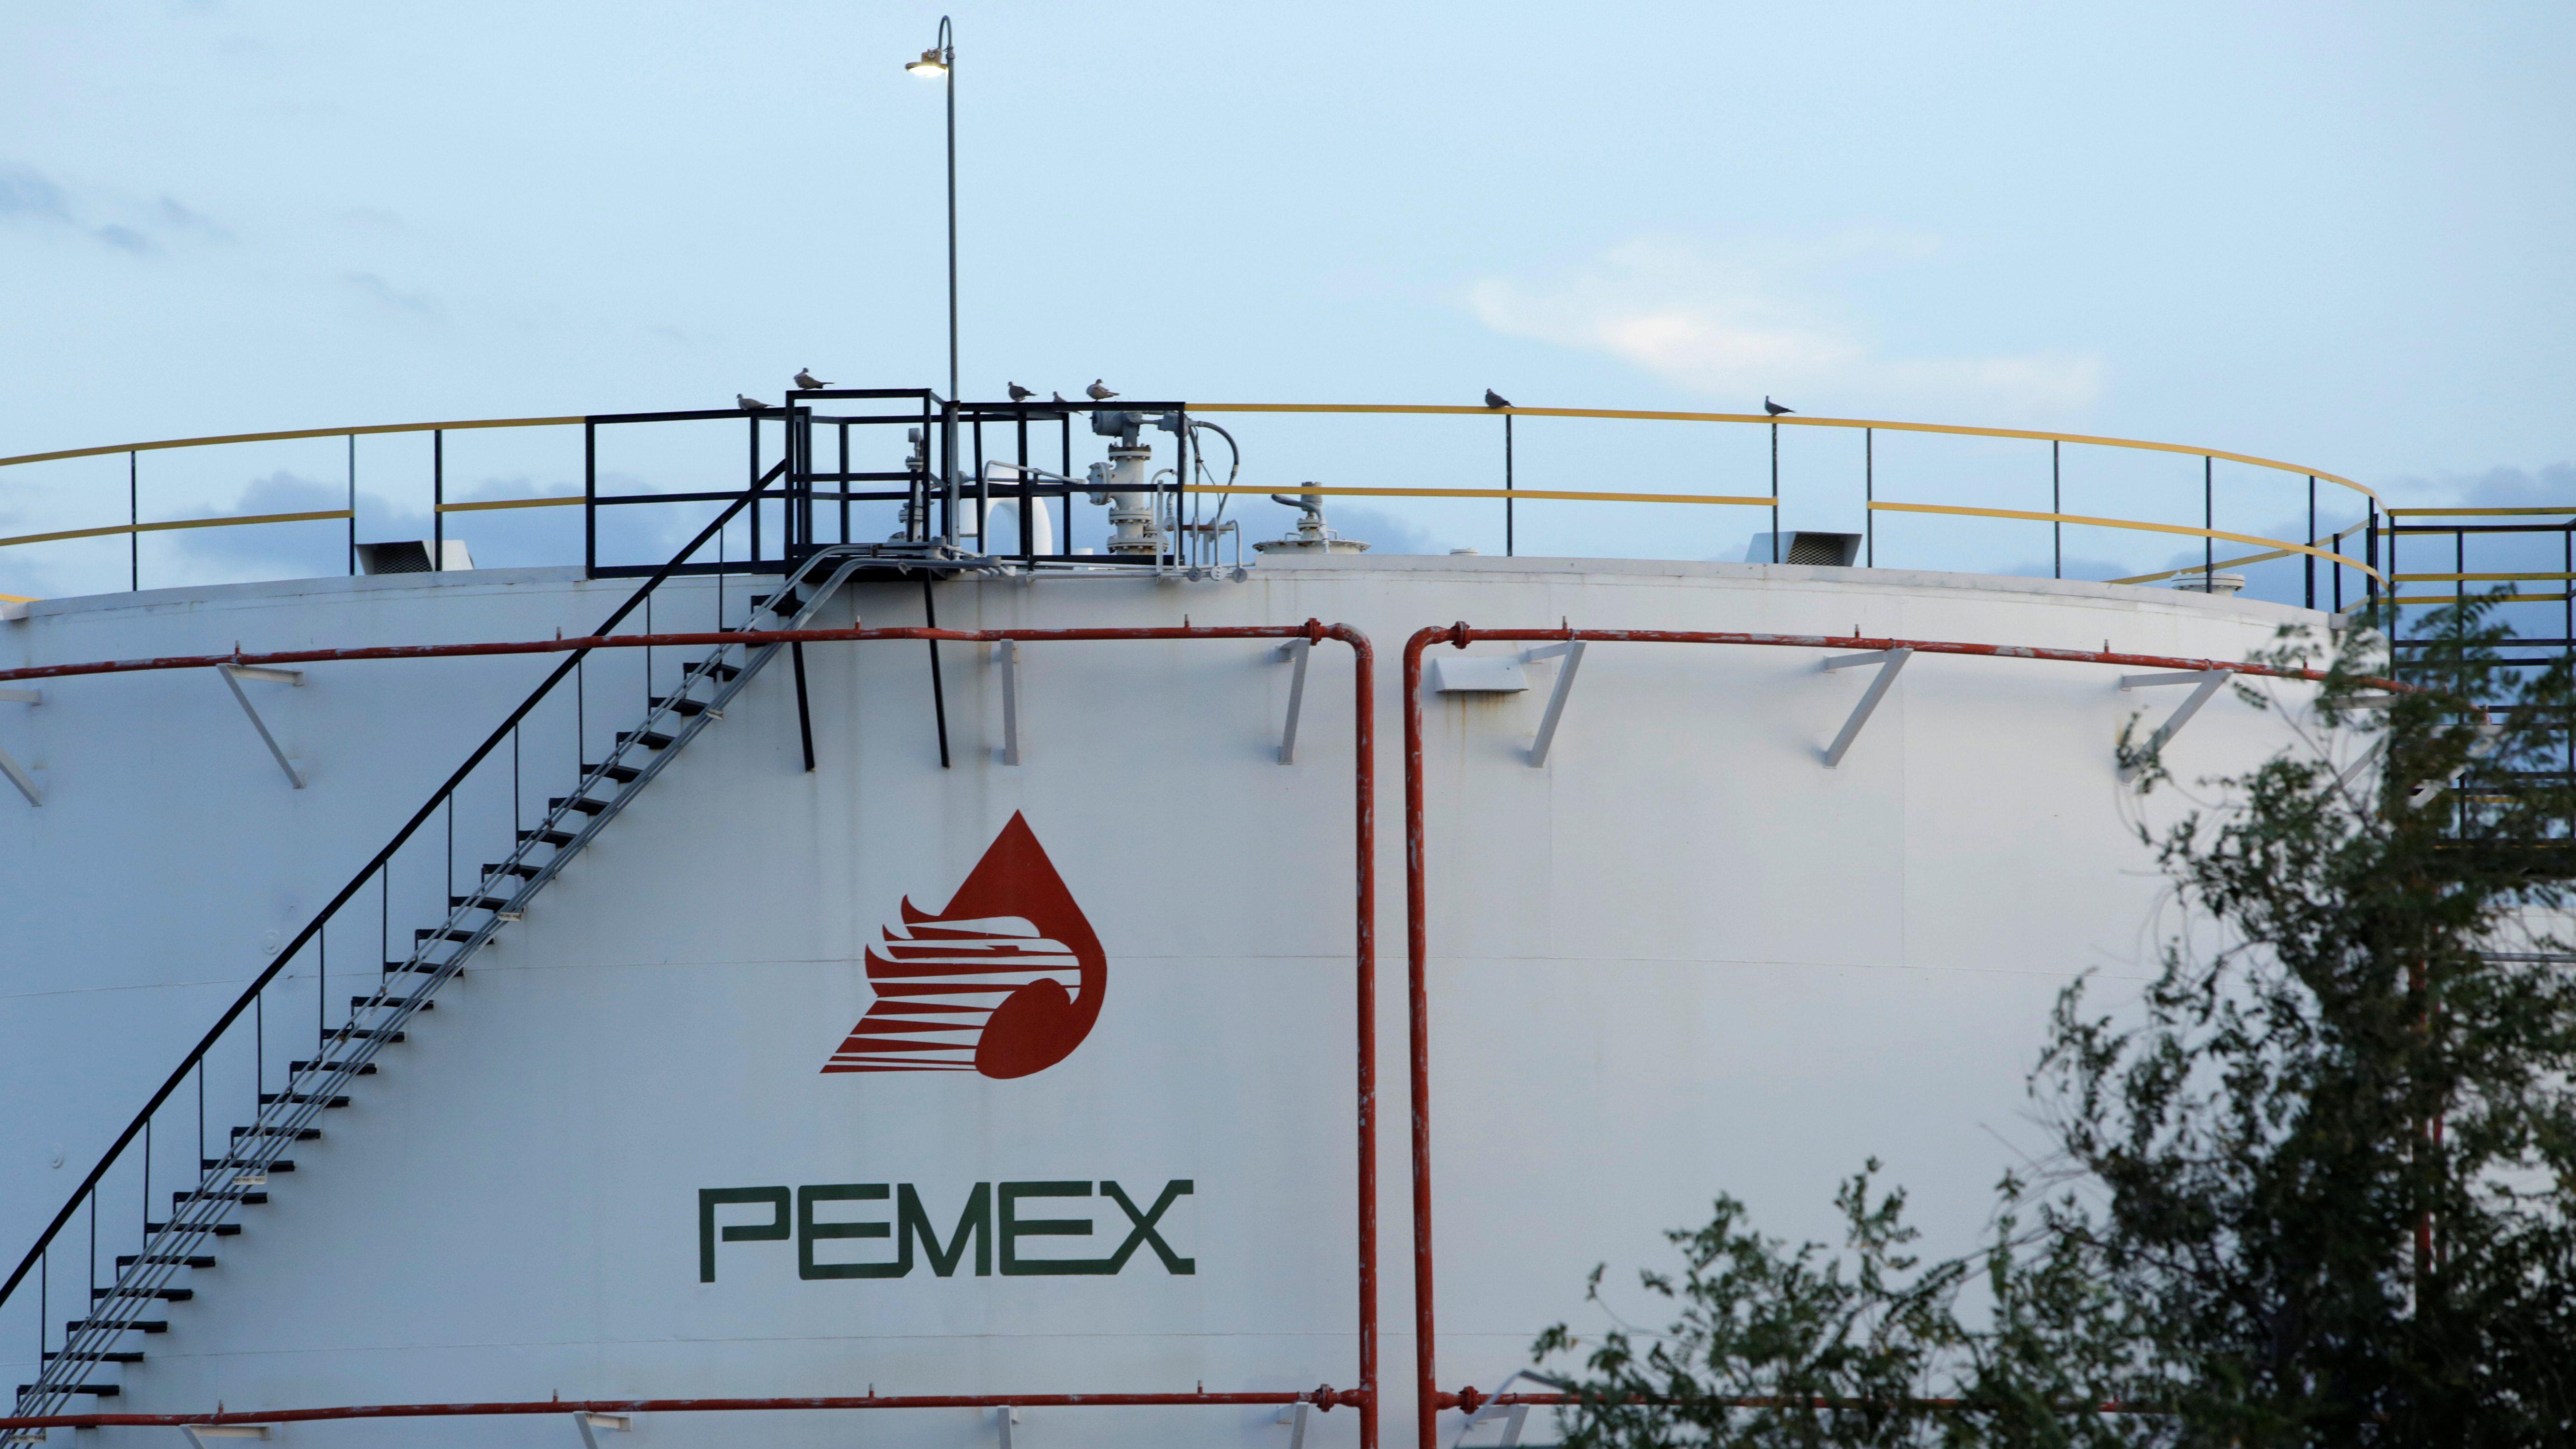 Calificación a Pemex no sorprende, pero preocupa: SHCP